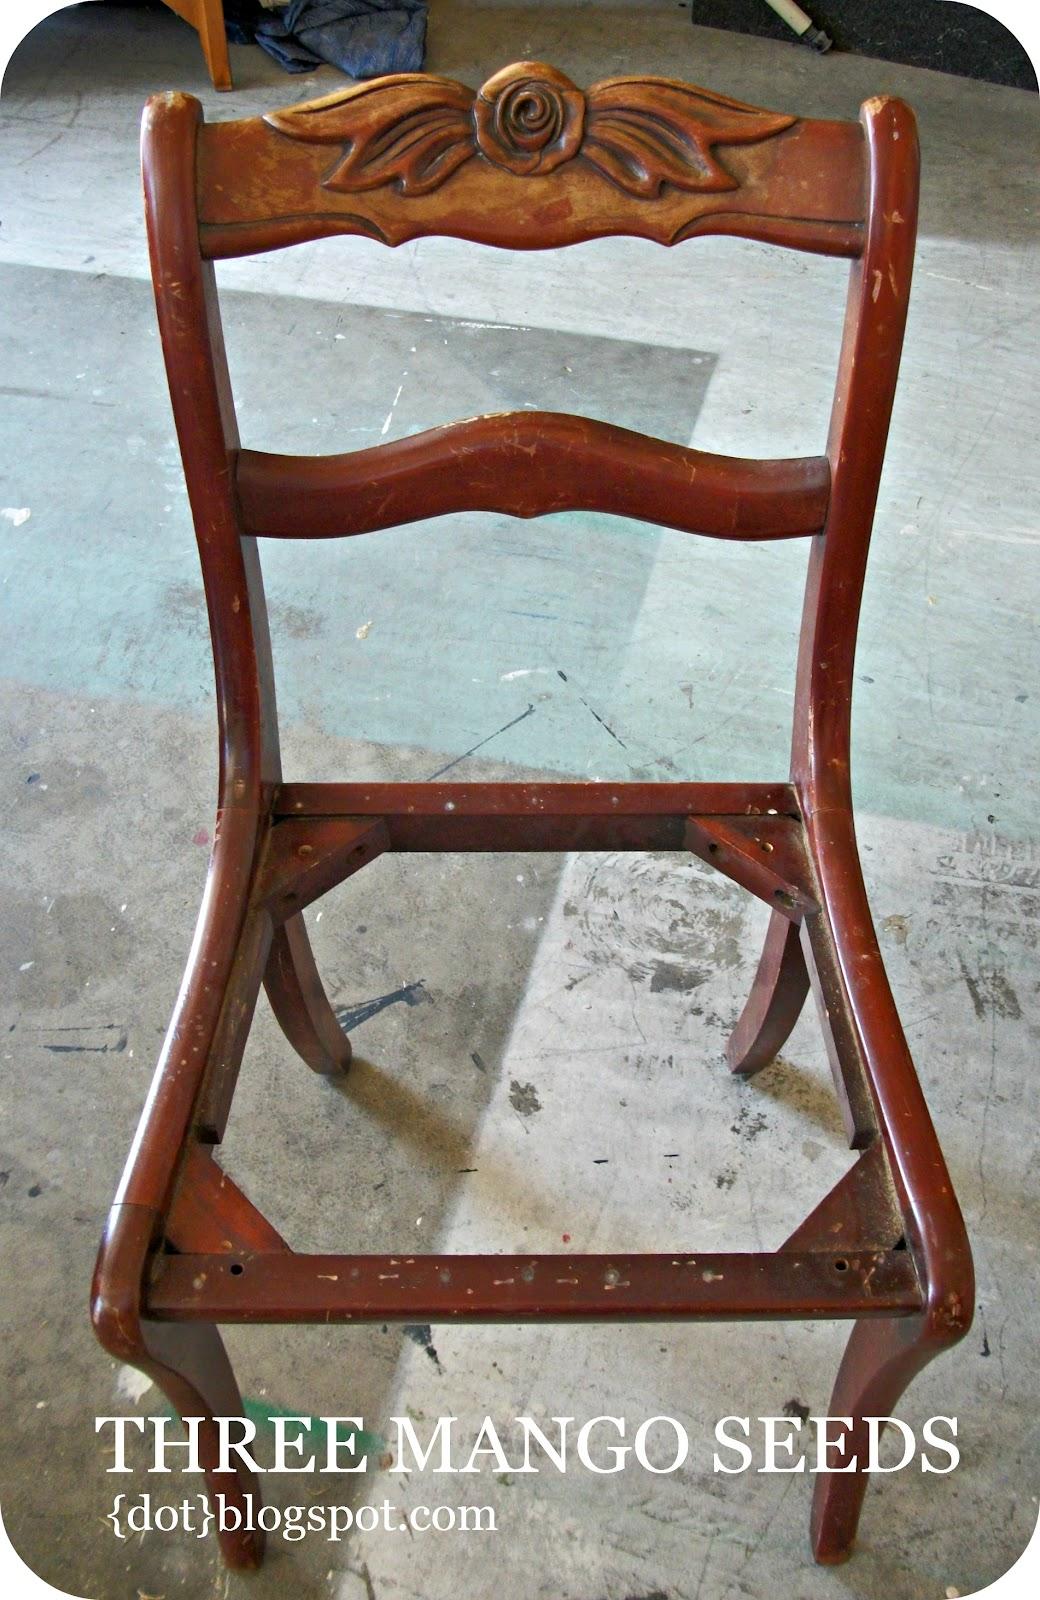 Three Mango Seeds: A Chair Makeover